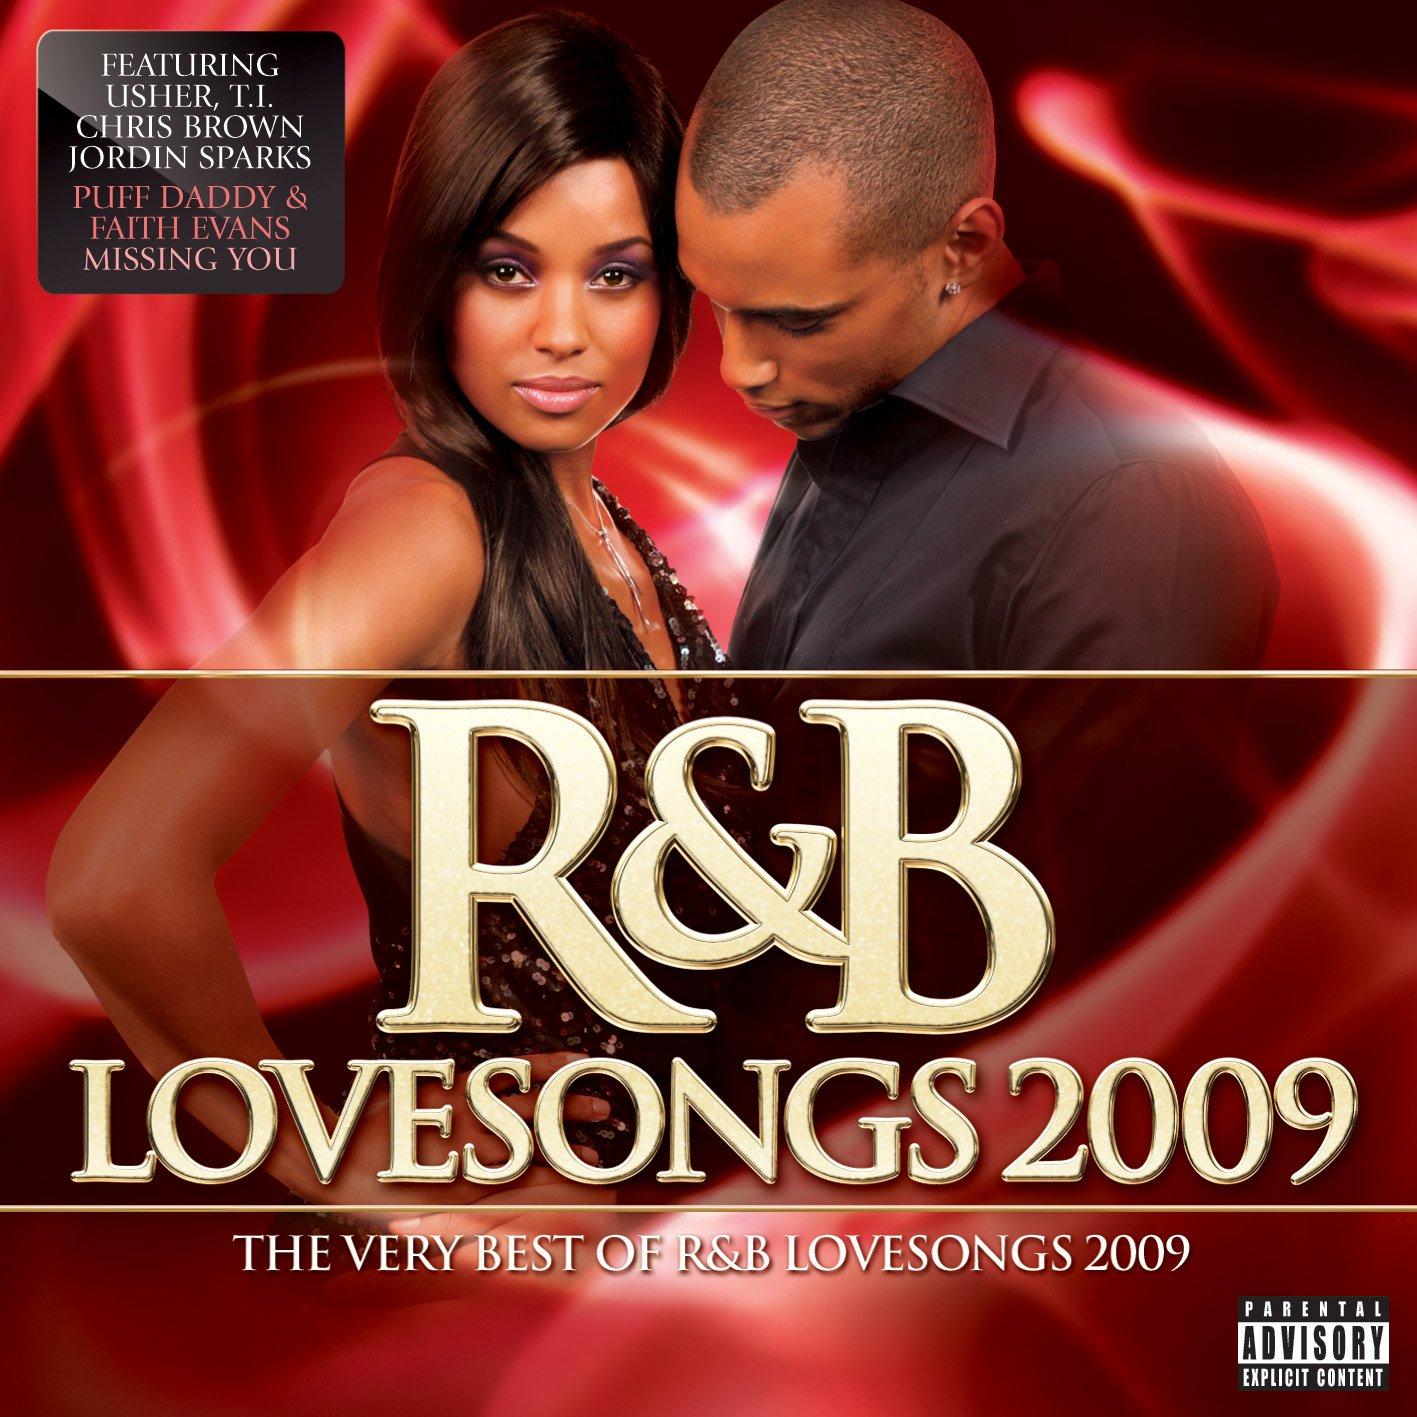 Hurt love songs r&b